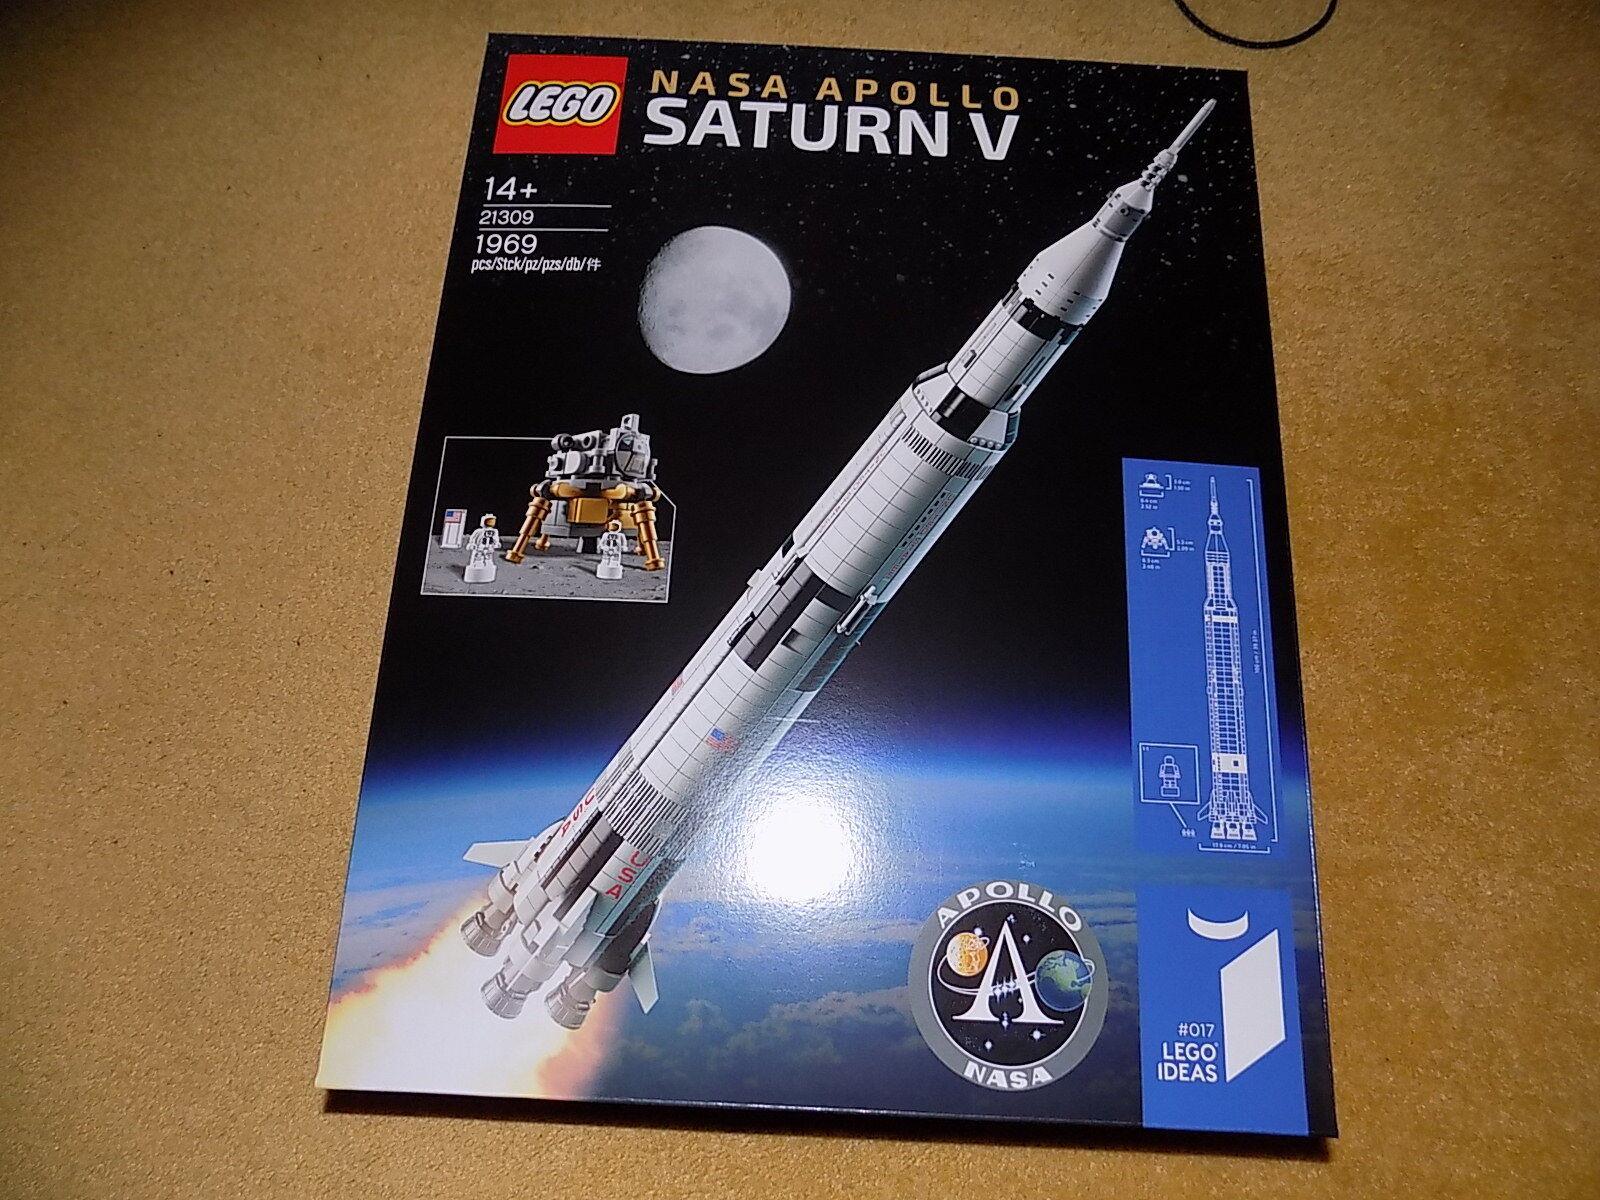 Lego Idées 21309 21309 21309 NASA Apollo Saturn V NEUF 25beb2